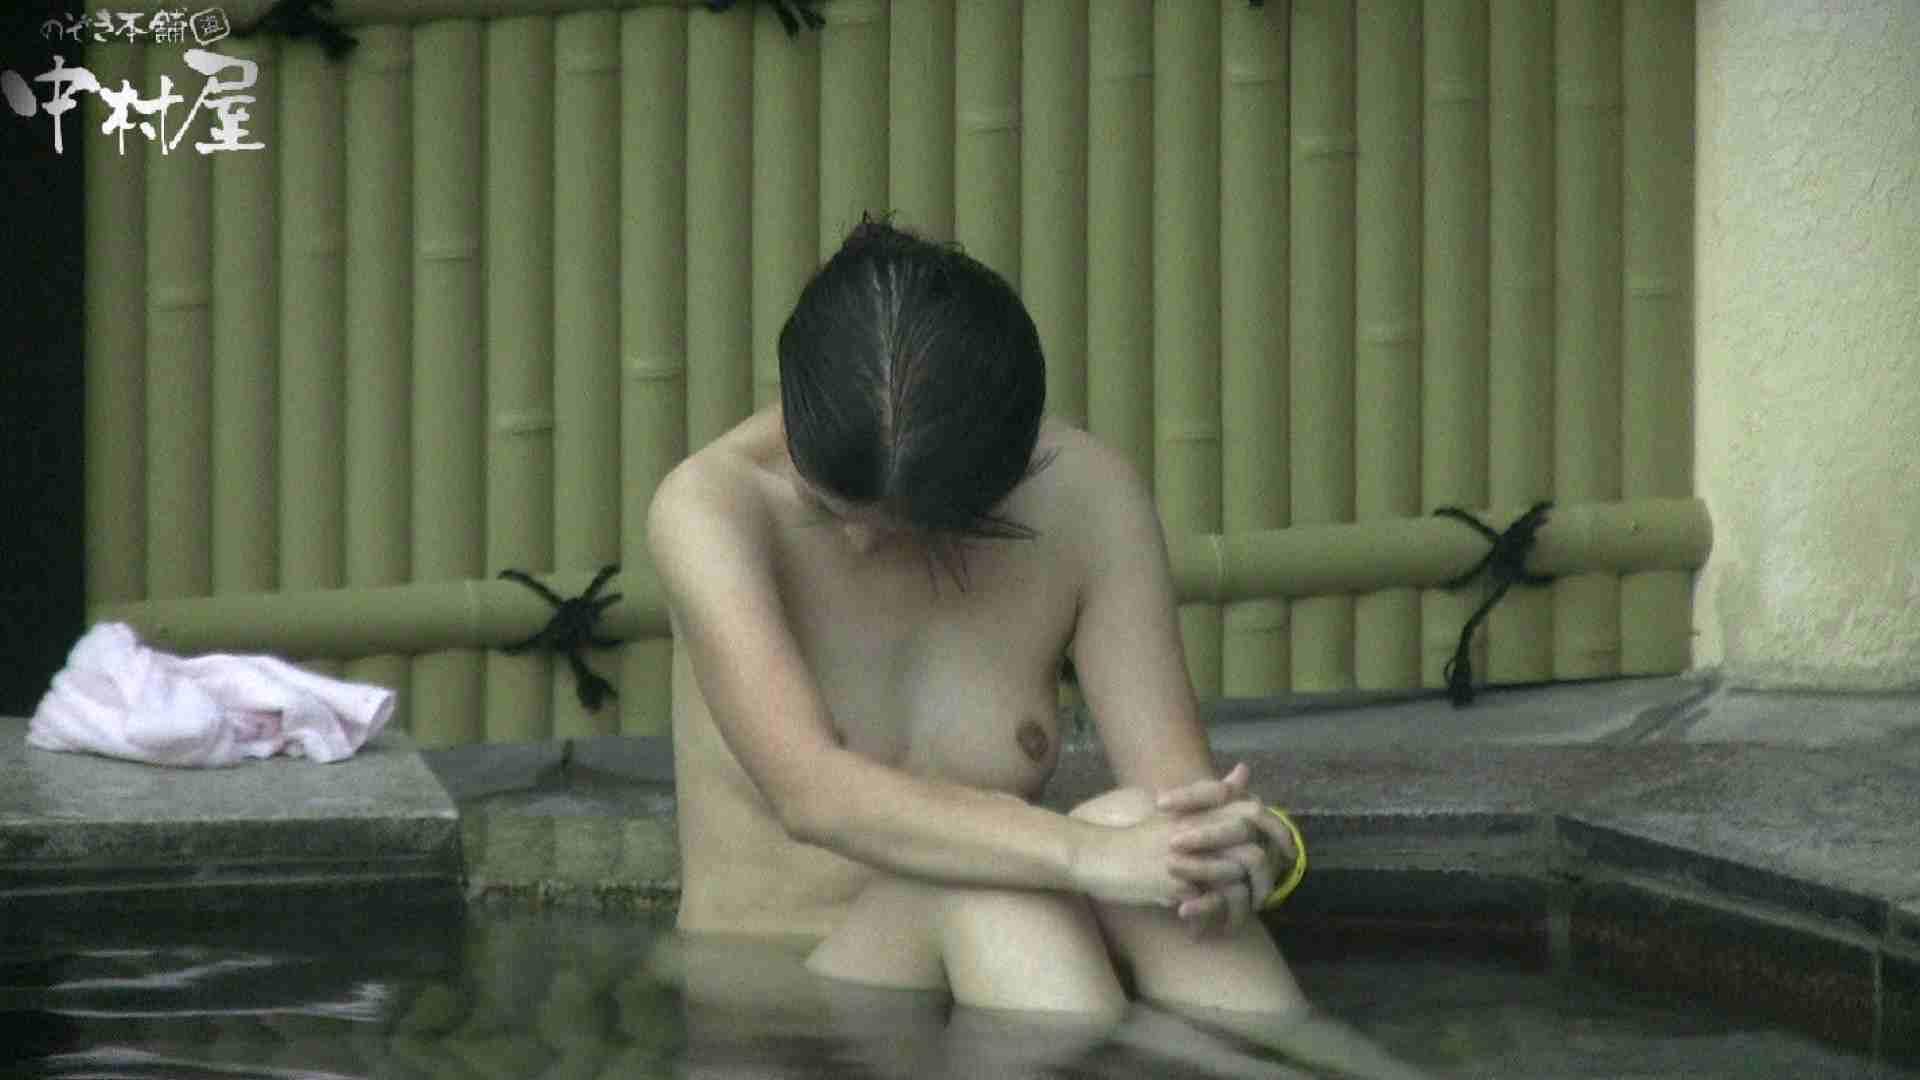 Aquaな露天風呂Vol.904 OL女体 アダルト動画キャプチャ 85連発 68